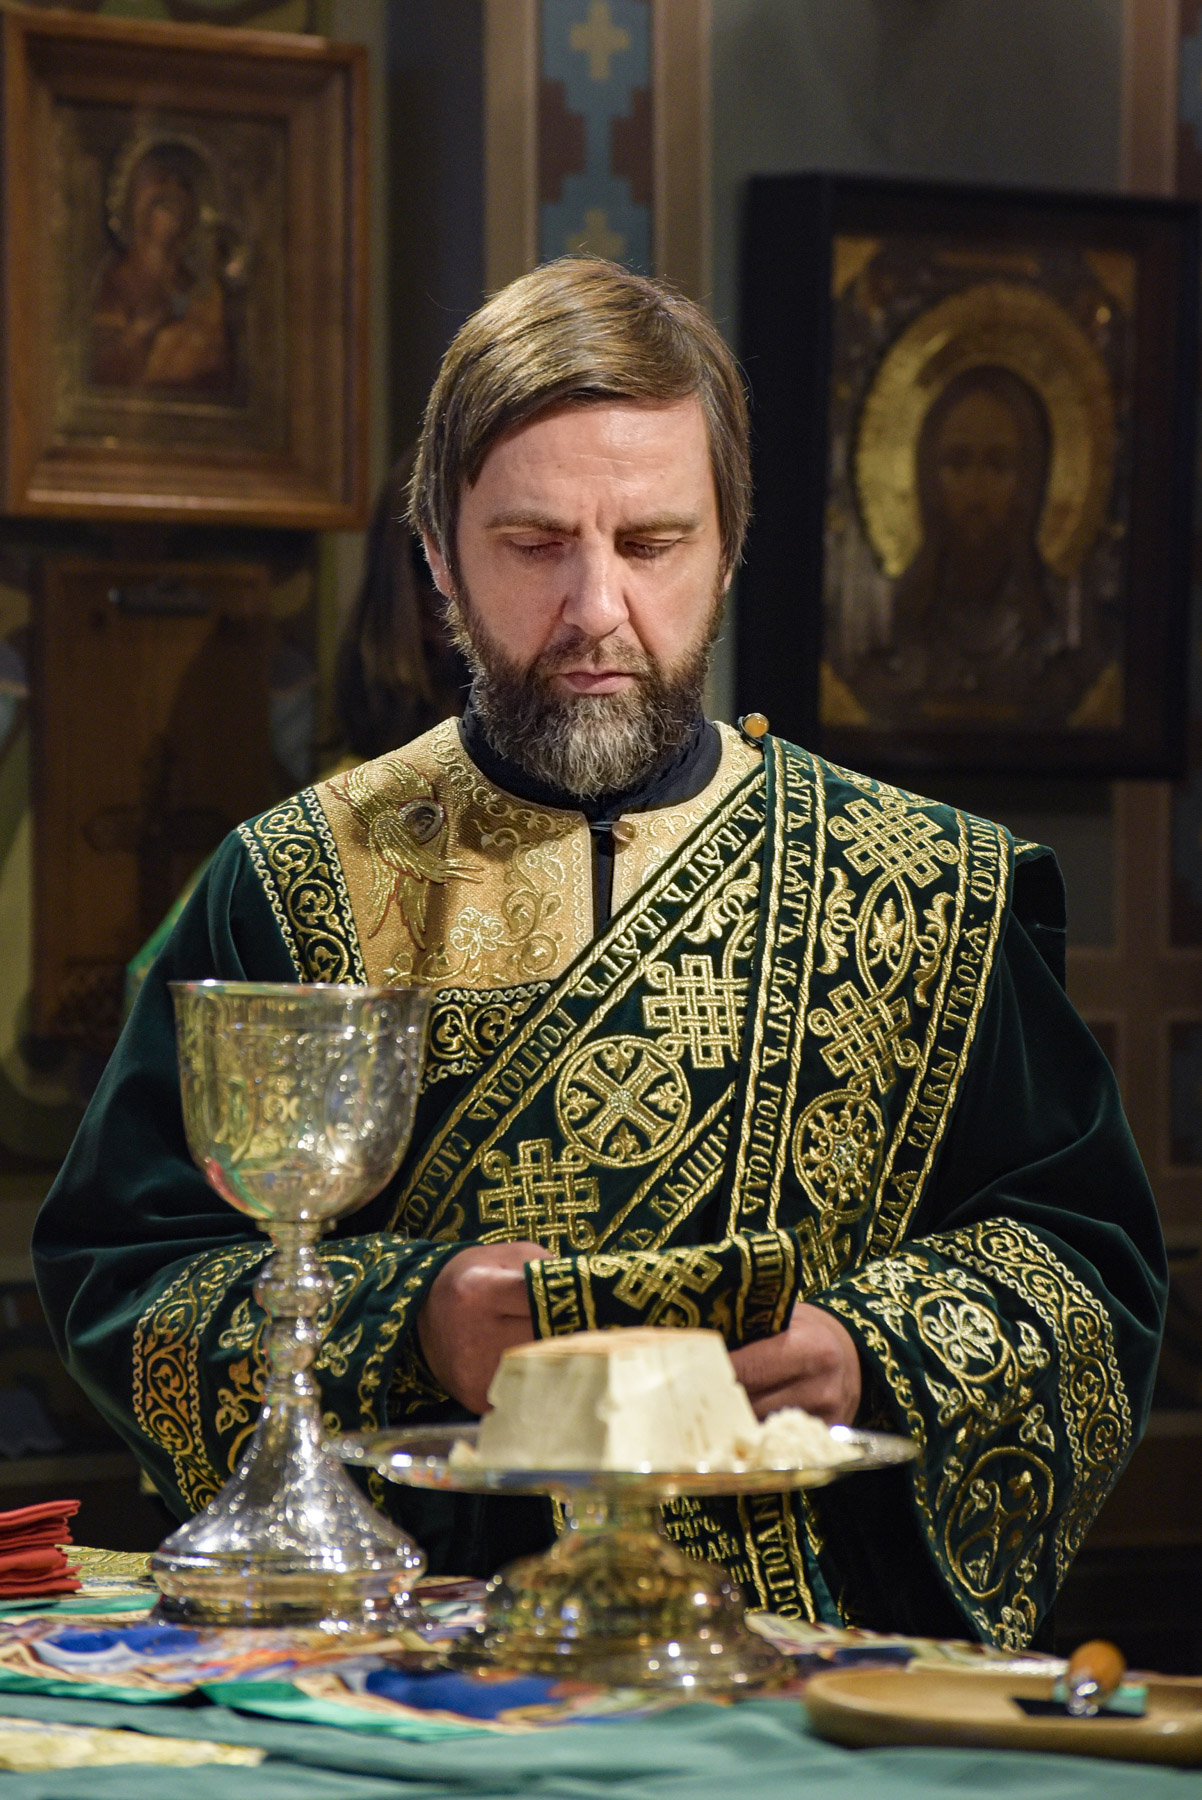 photos of orthodox christmas 0194 2